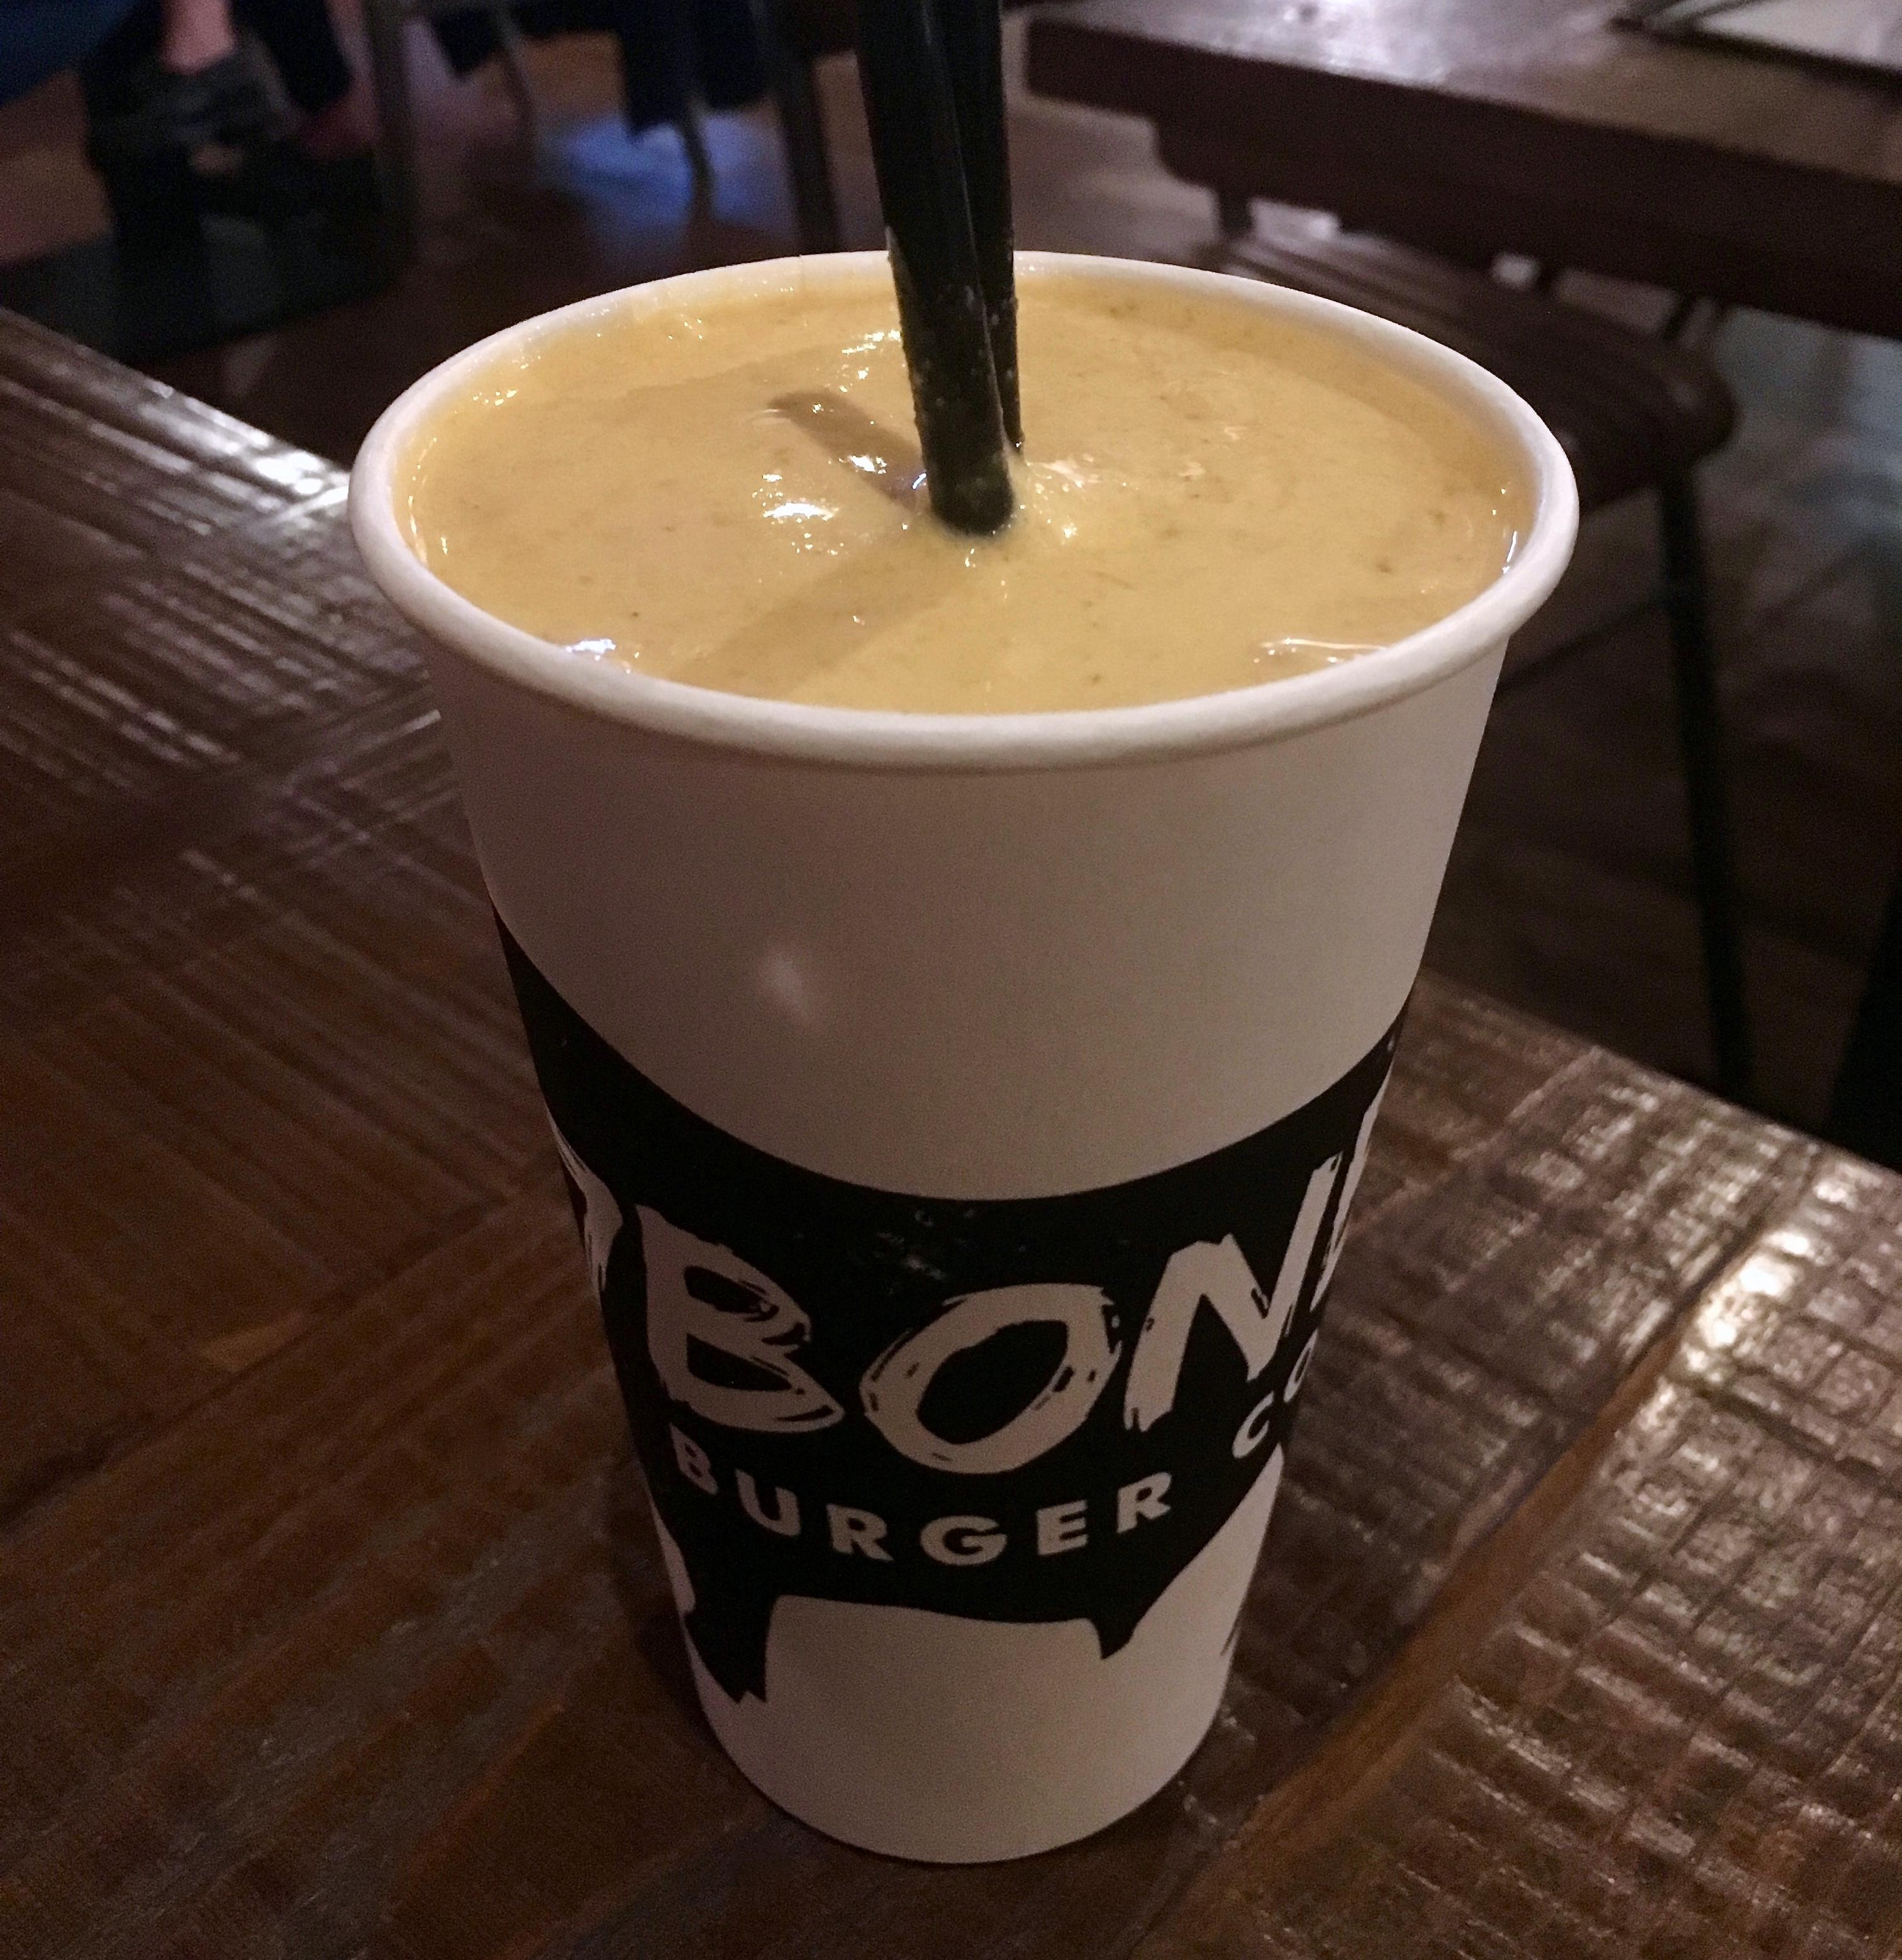 7Bone Burger Co. Banoffee Milkshake